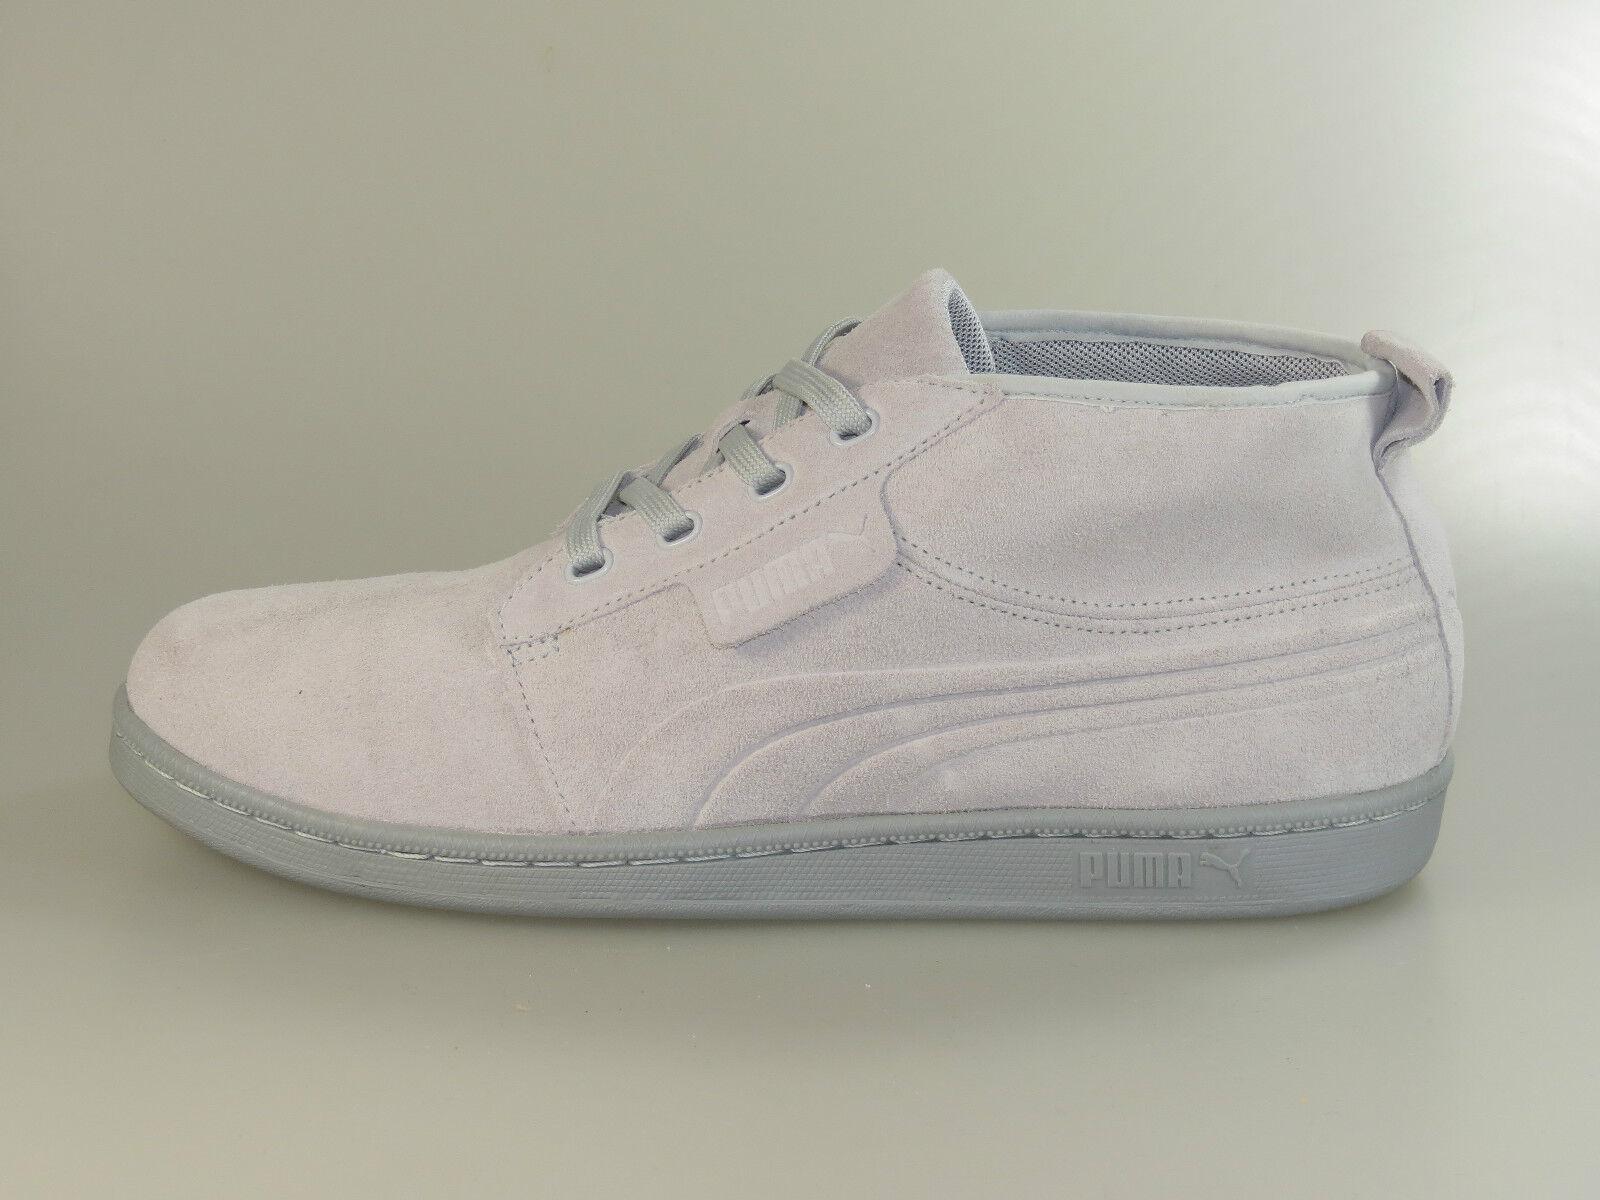 Puma Schuhe Hawthorne Mid 351287 +Neu+ 02 Gray Violet/Limestone Gray +Neu+ 351287 ver. Größen f786ee